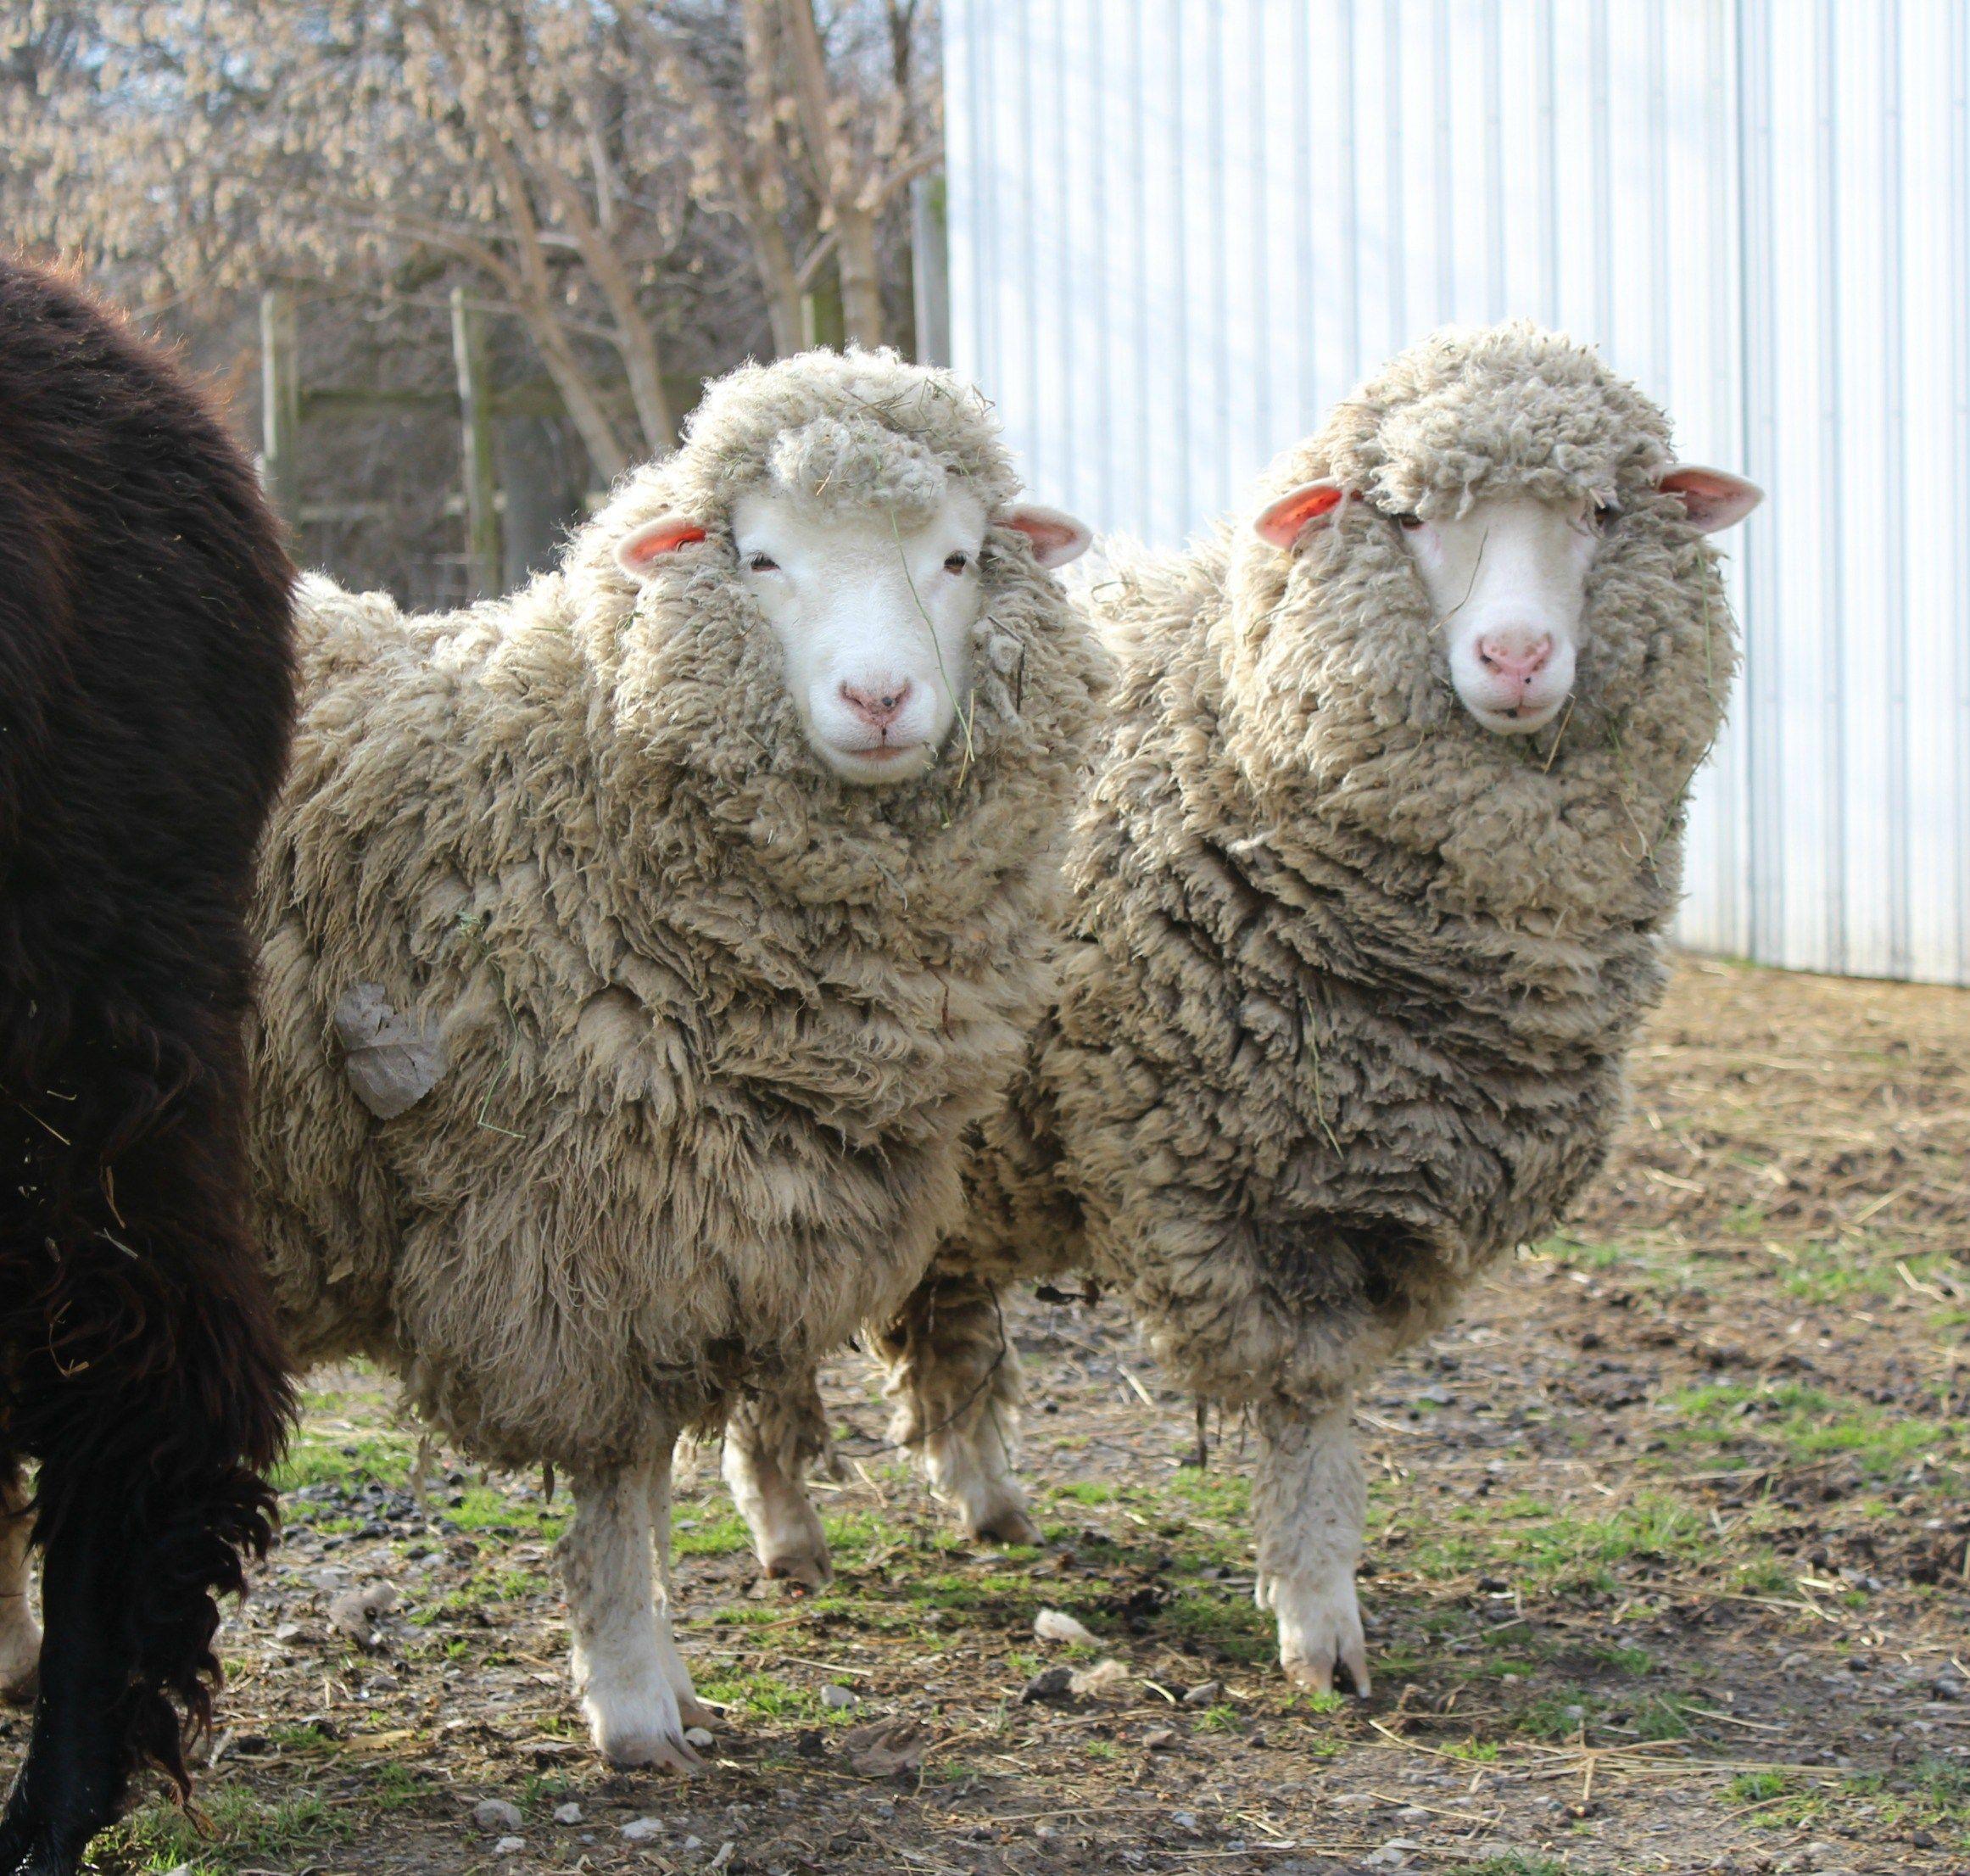 cormo ewe sheep wool fleece fiber farm anytime farm pinterest